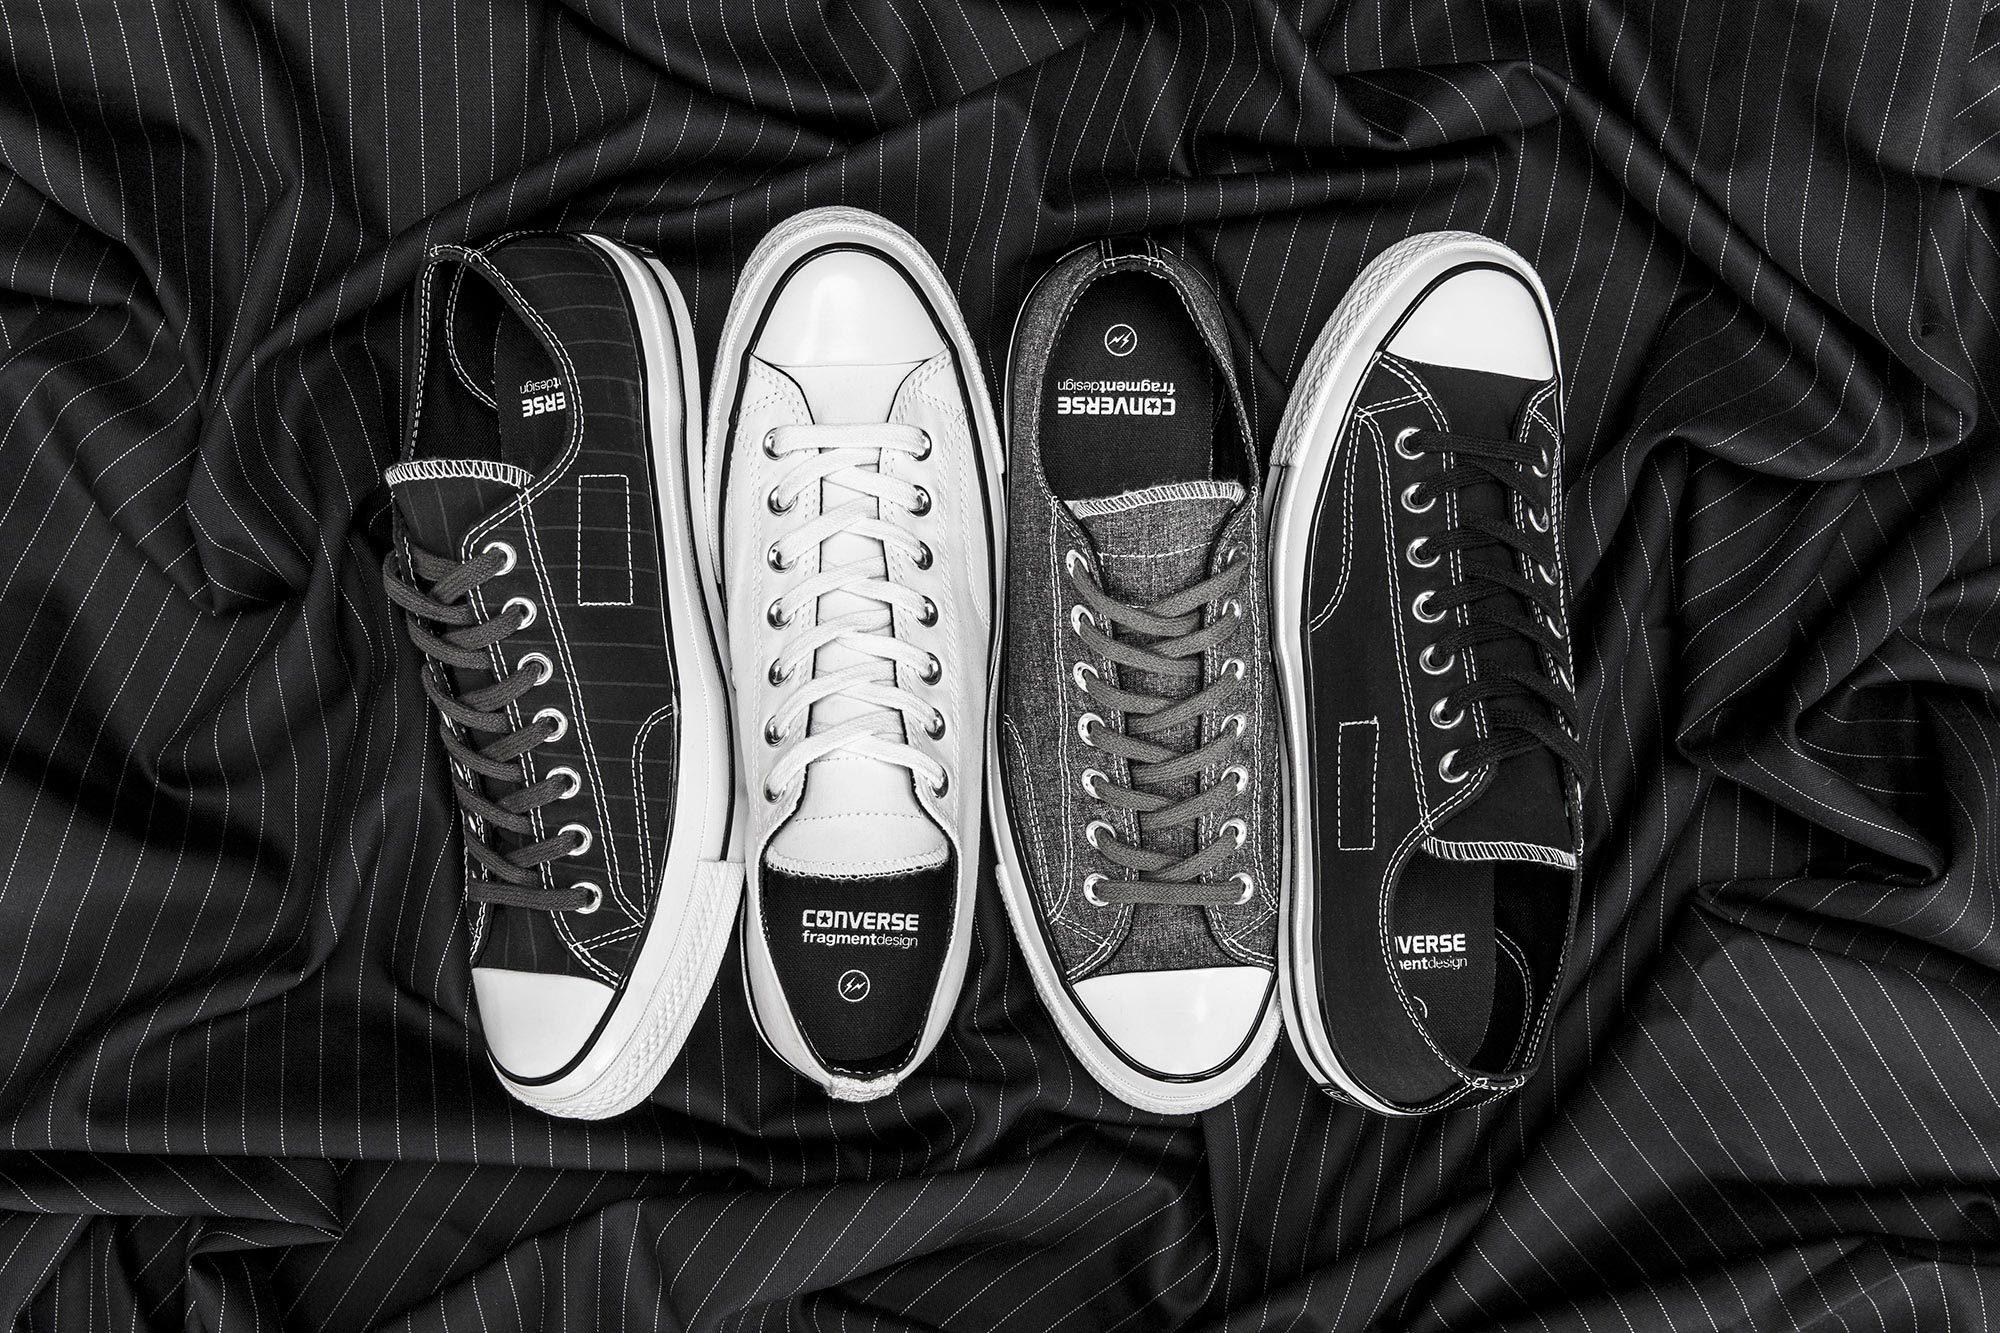 fragment-design-x-converse-chuck-taylor-all-star-70-tuxedo-pack-1